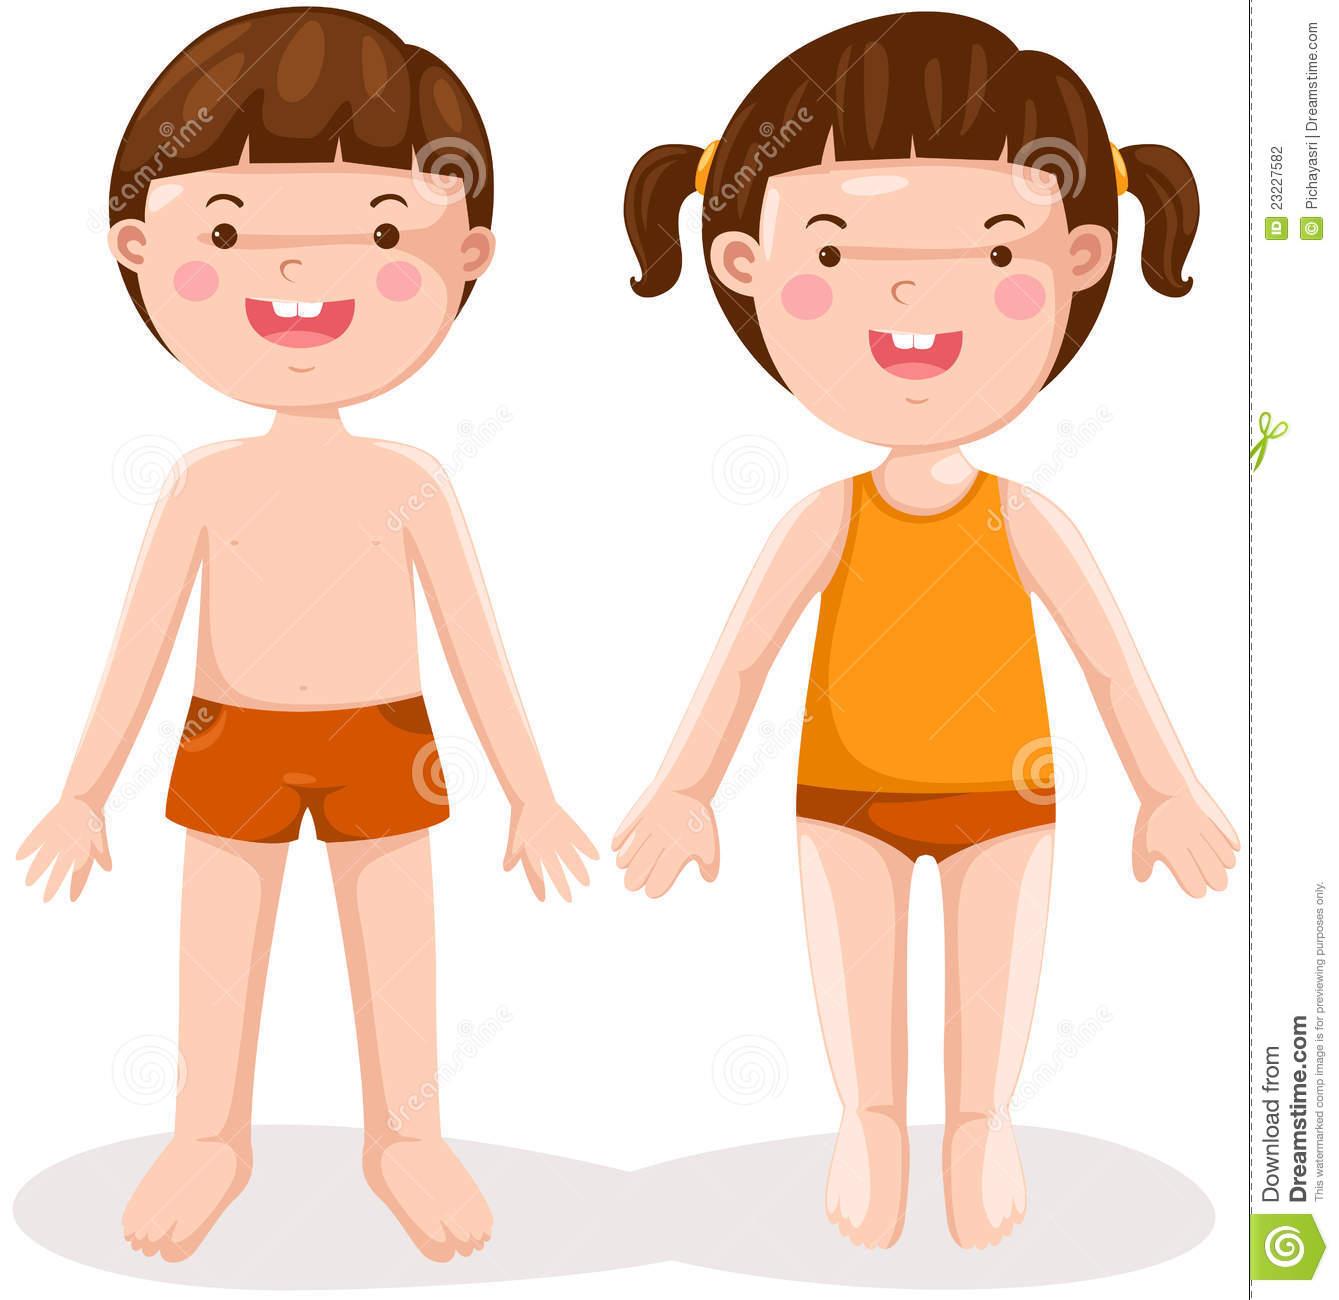 Rear clipart child body Body clipart body Child clipart